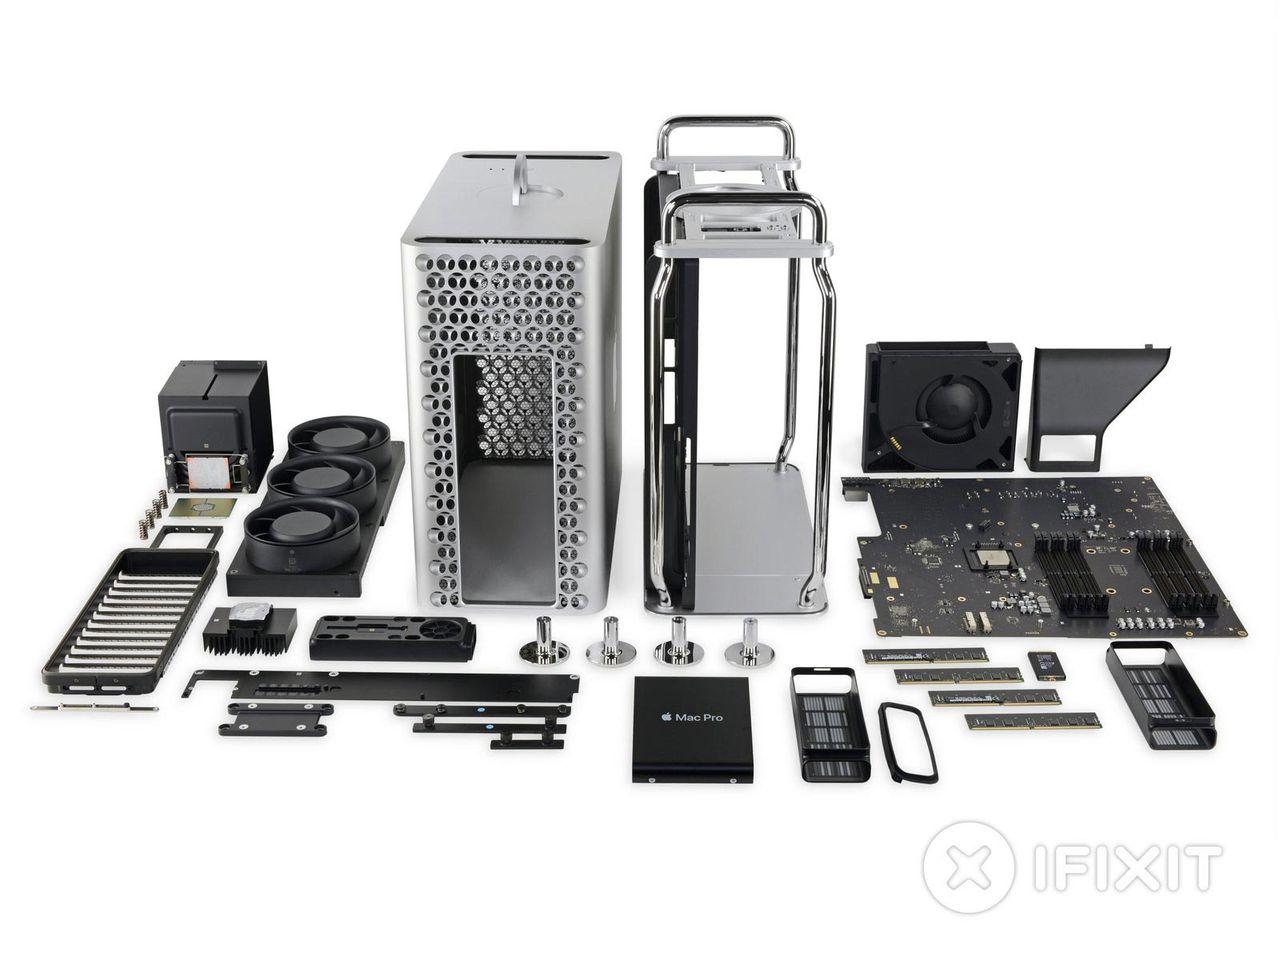 Mac Pro får toppbetyg av iFixit